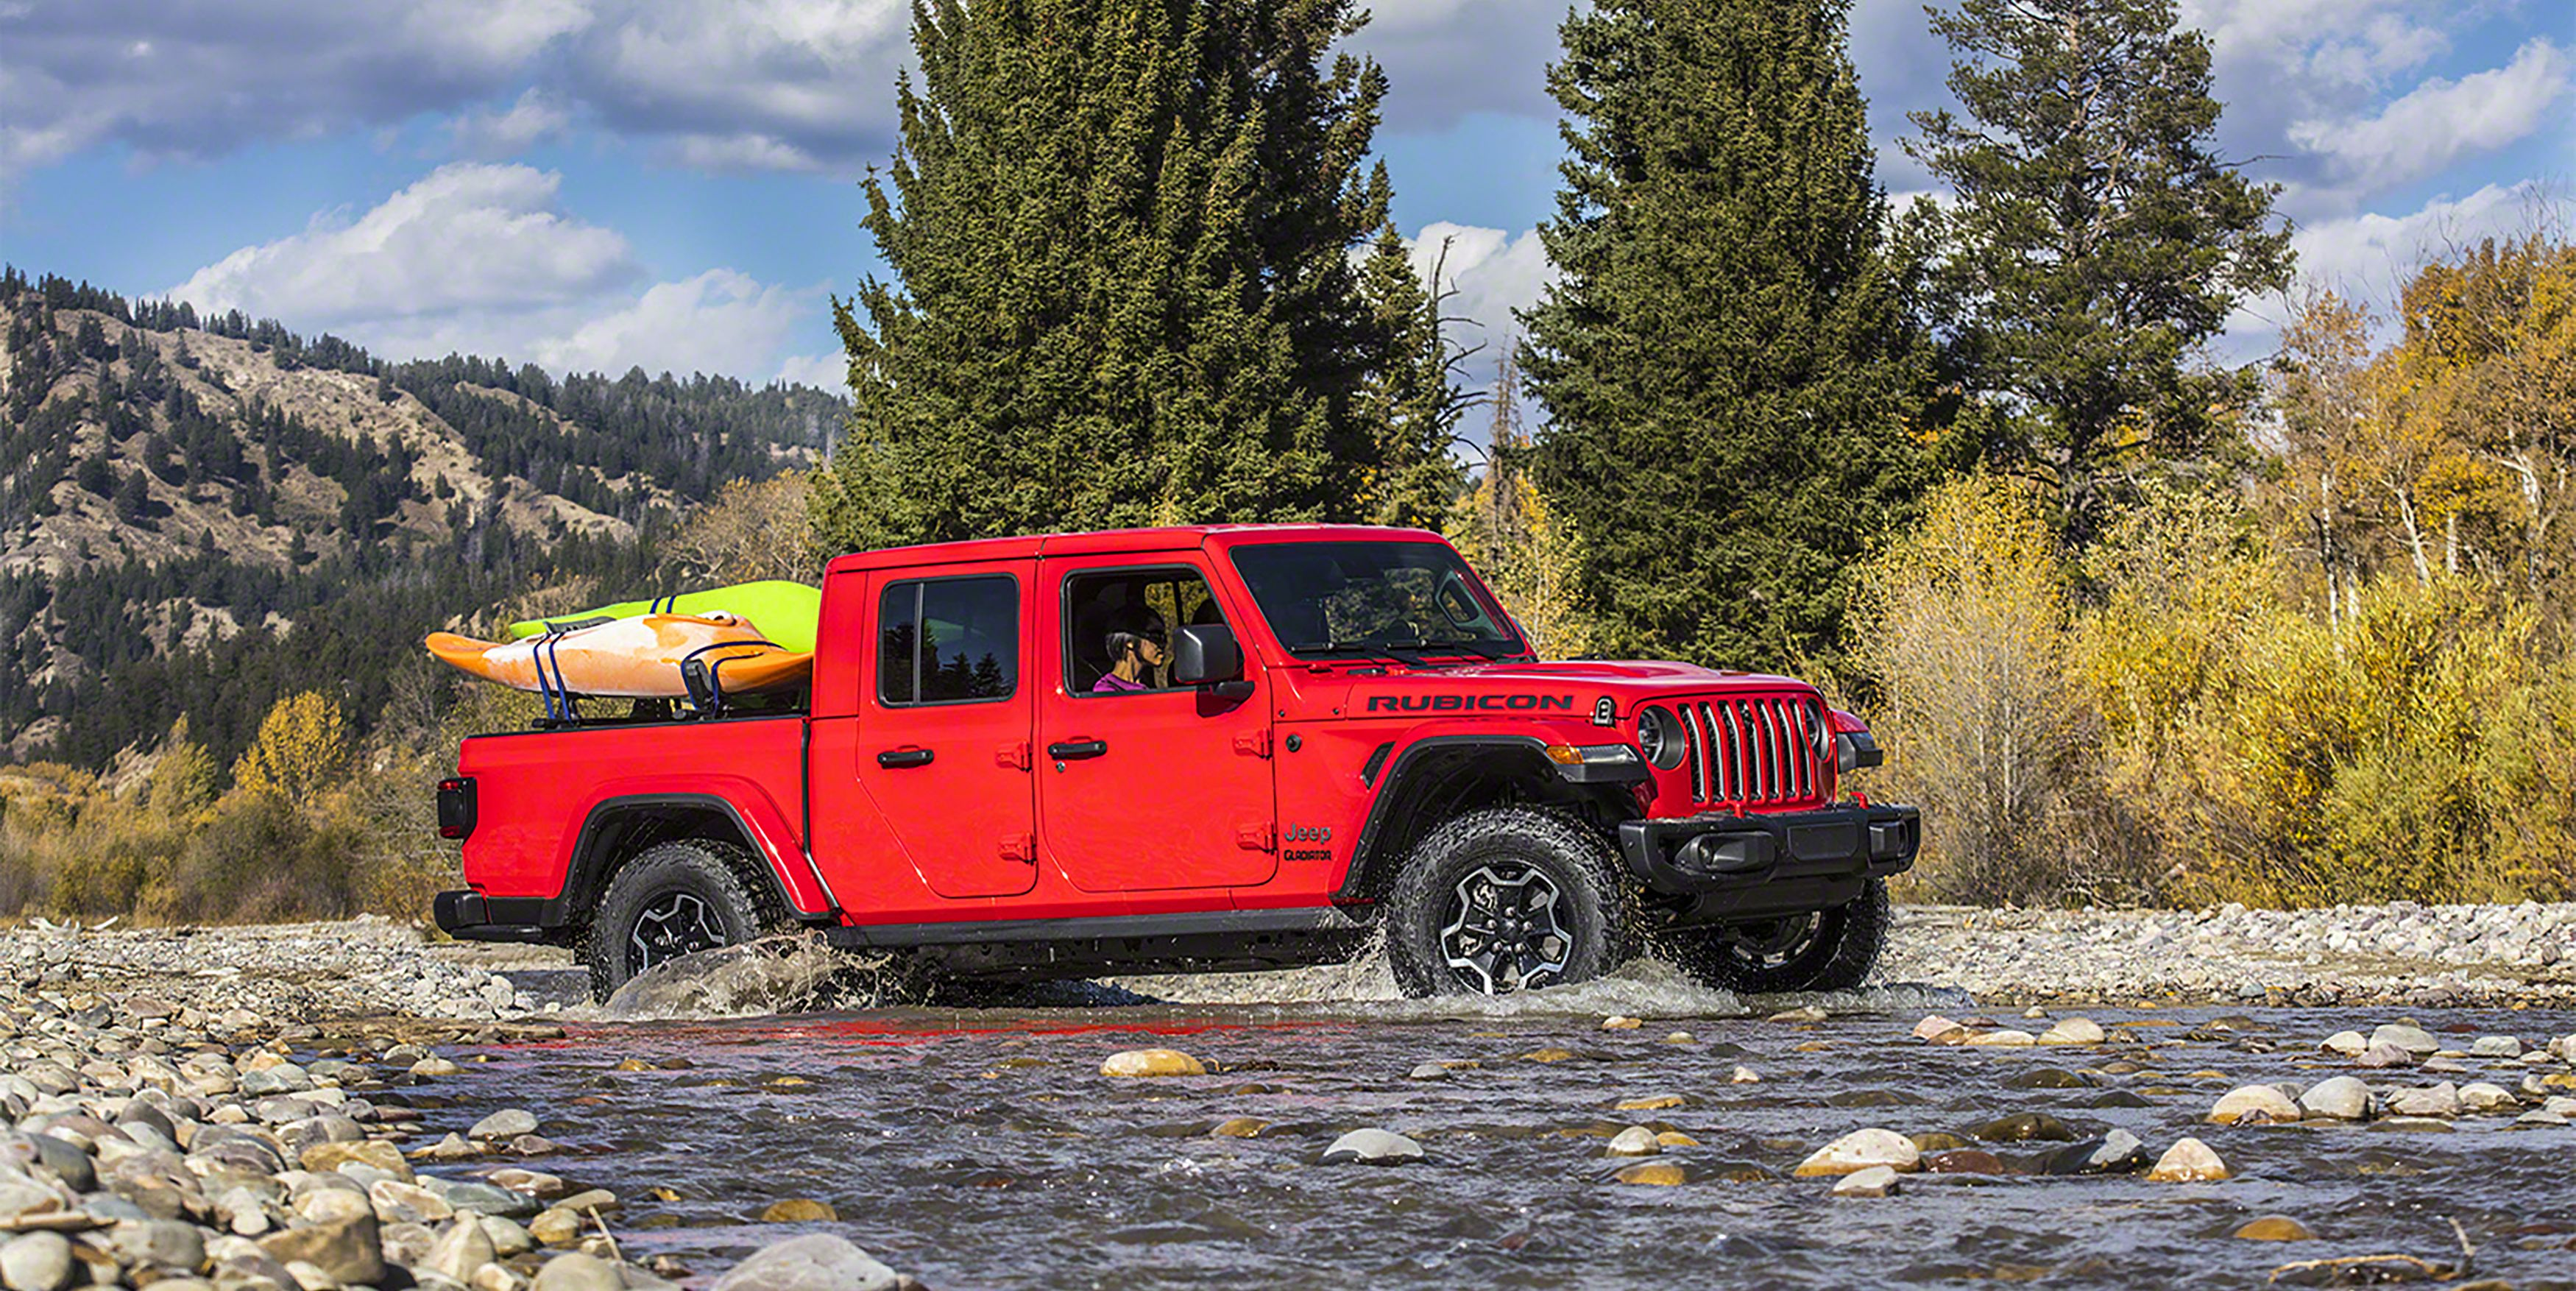 2020 Jeep Gladiator First Photos, Info, Specs - Jeep ...